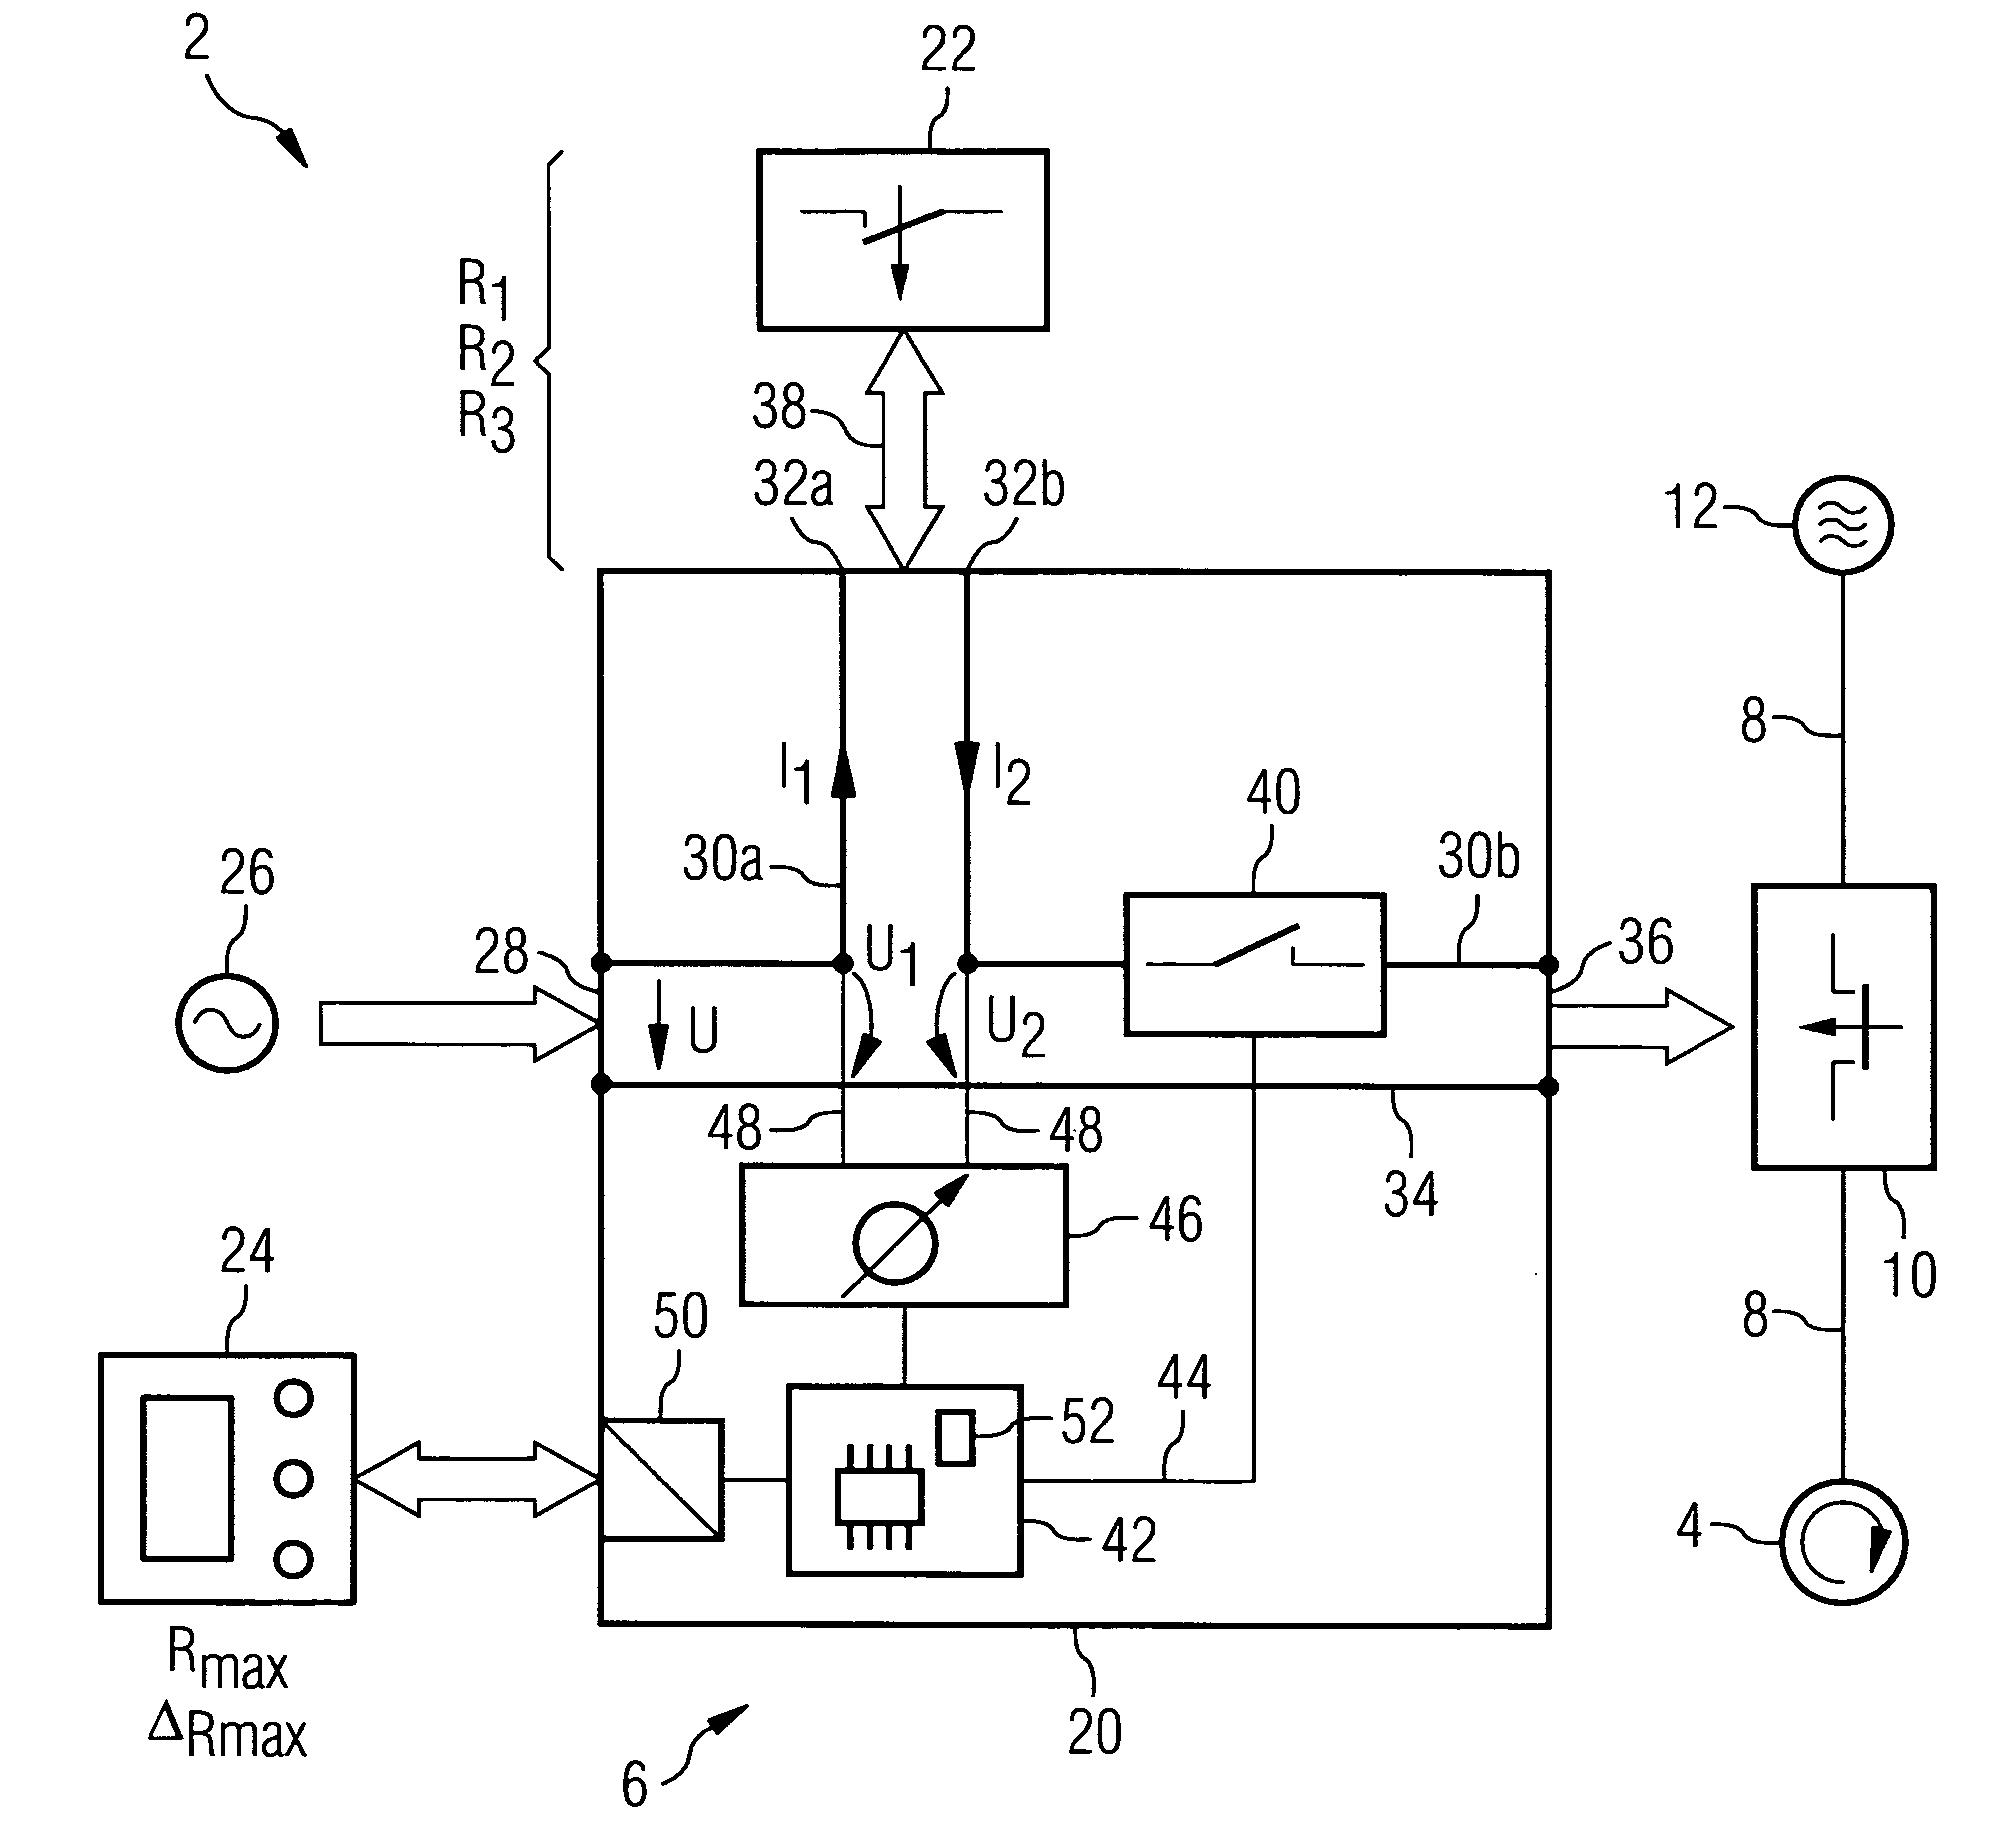 Prestolite Wiring Diagram Bobcat 610 Expert Schematics 863 Fuse Box Schematic Diagrams Parts